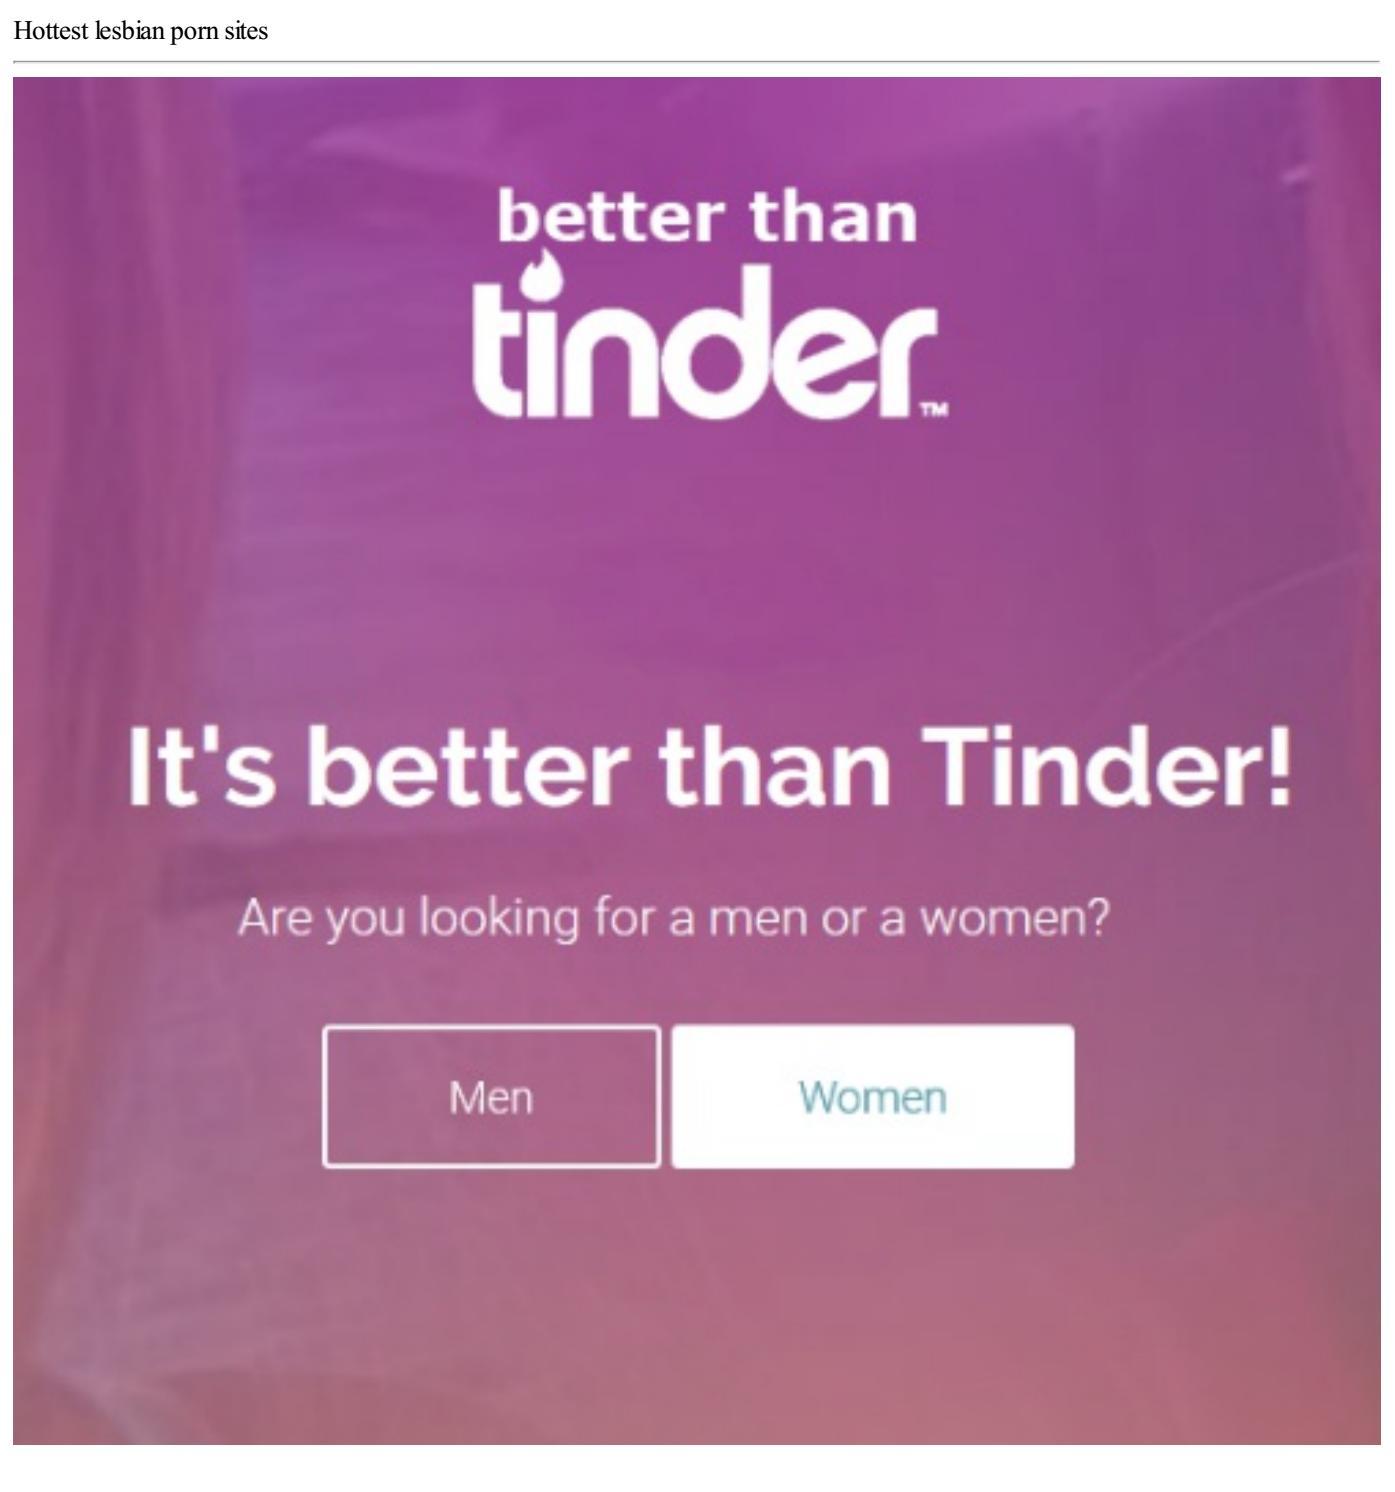 Lesbianporn site